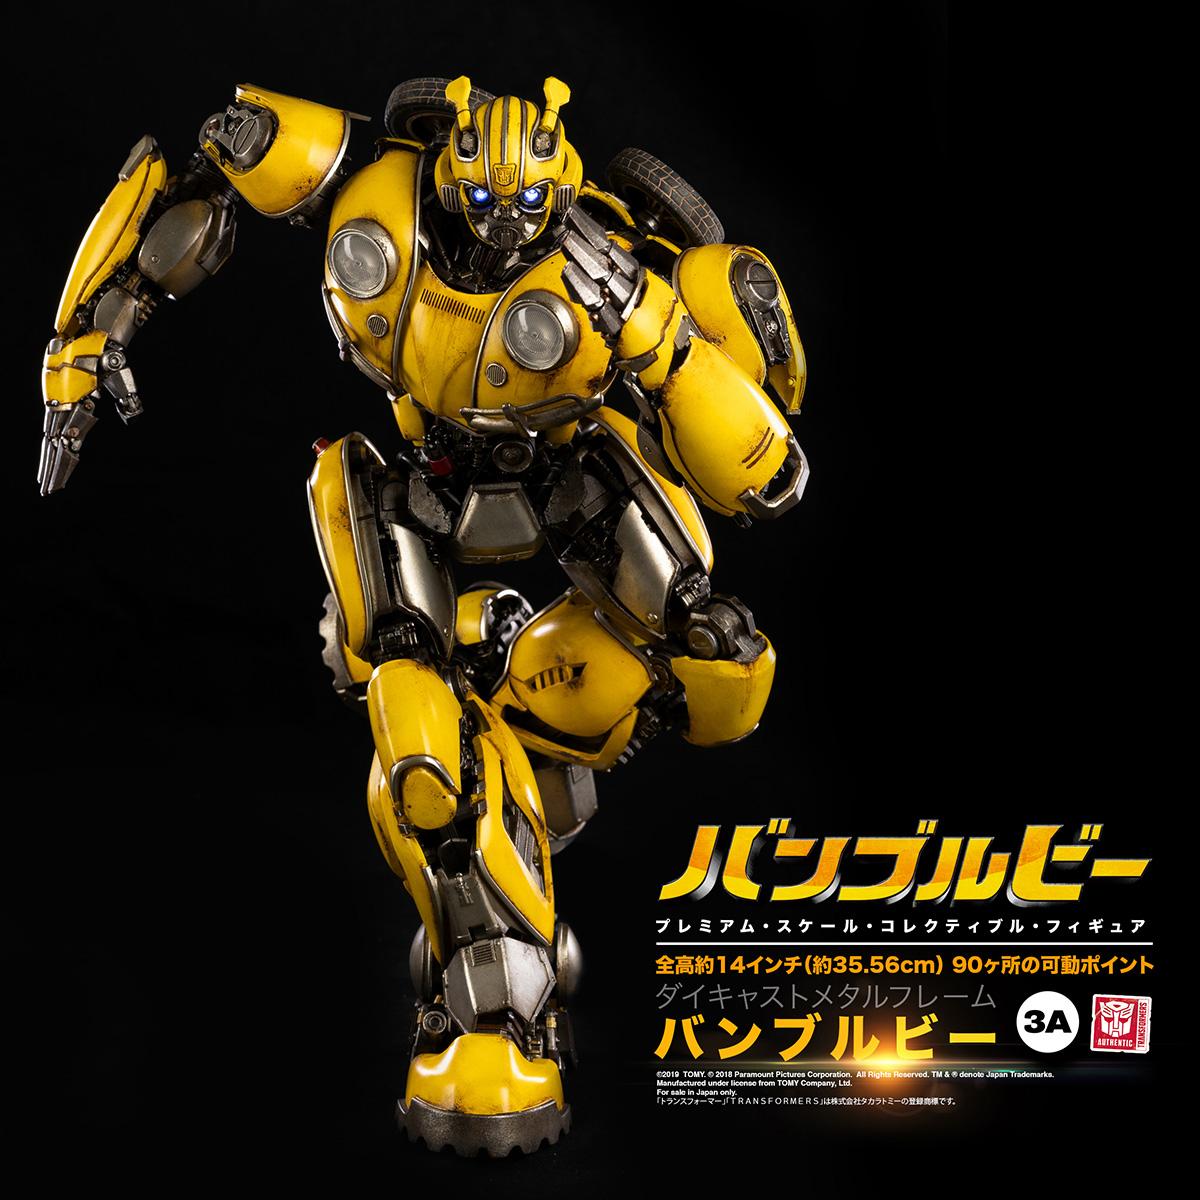 Bumblebee_JAP_PM_00113.jpg